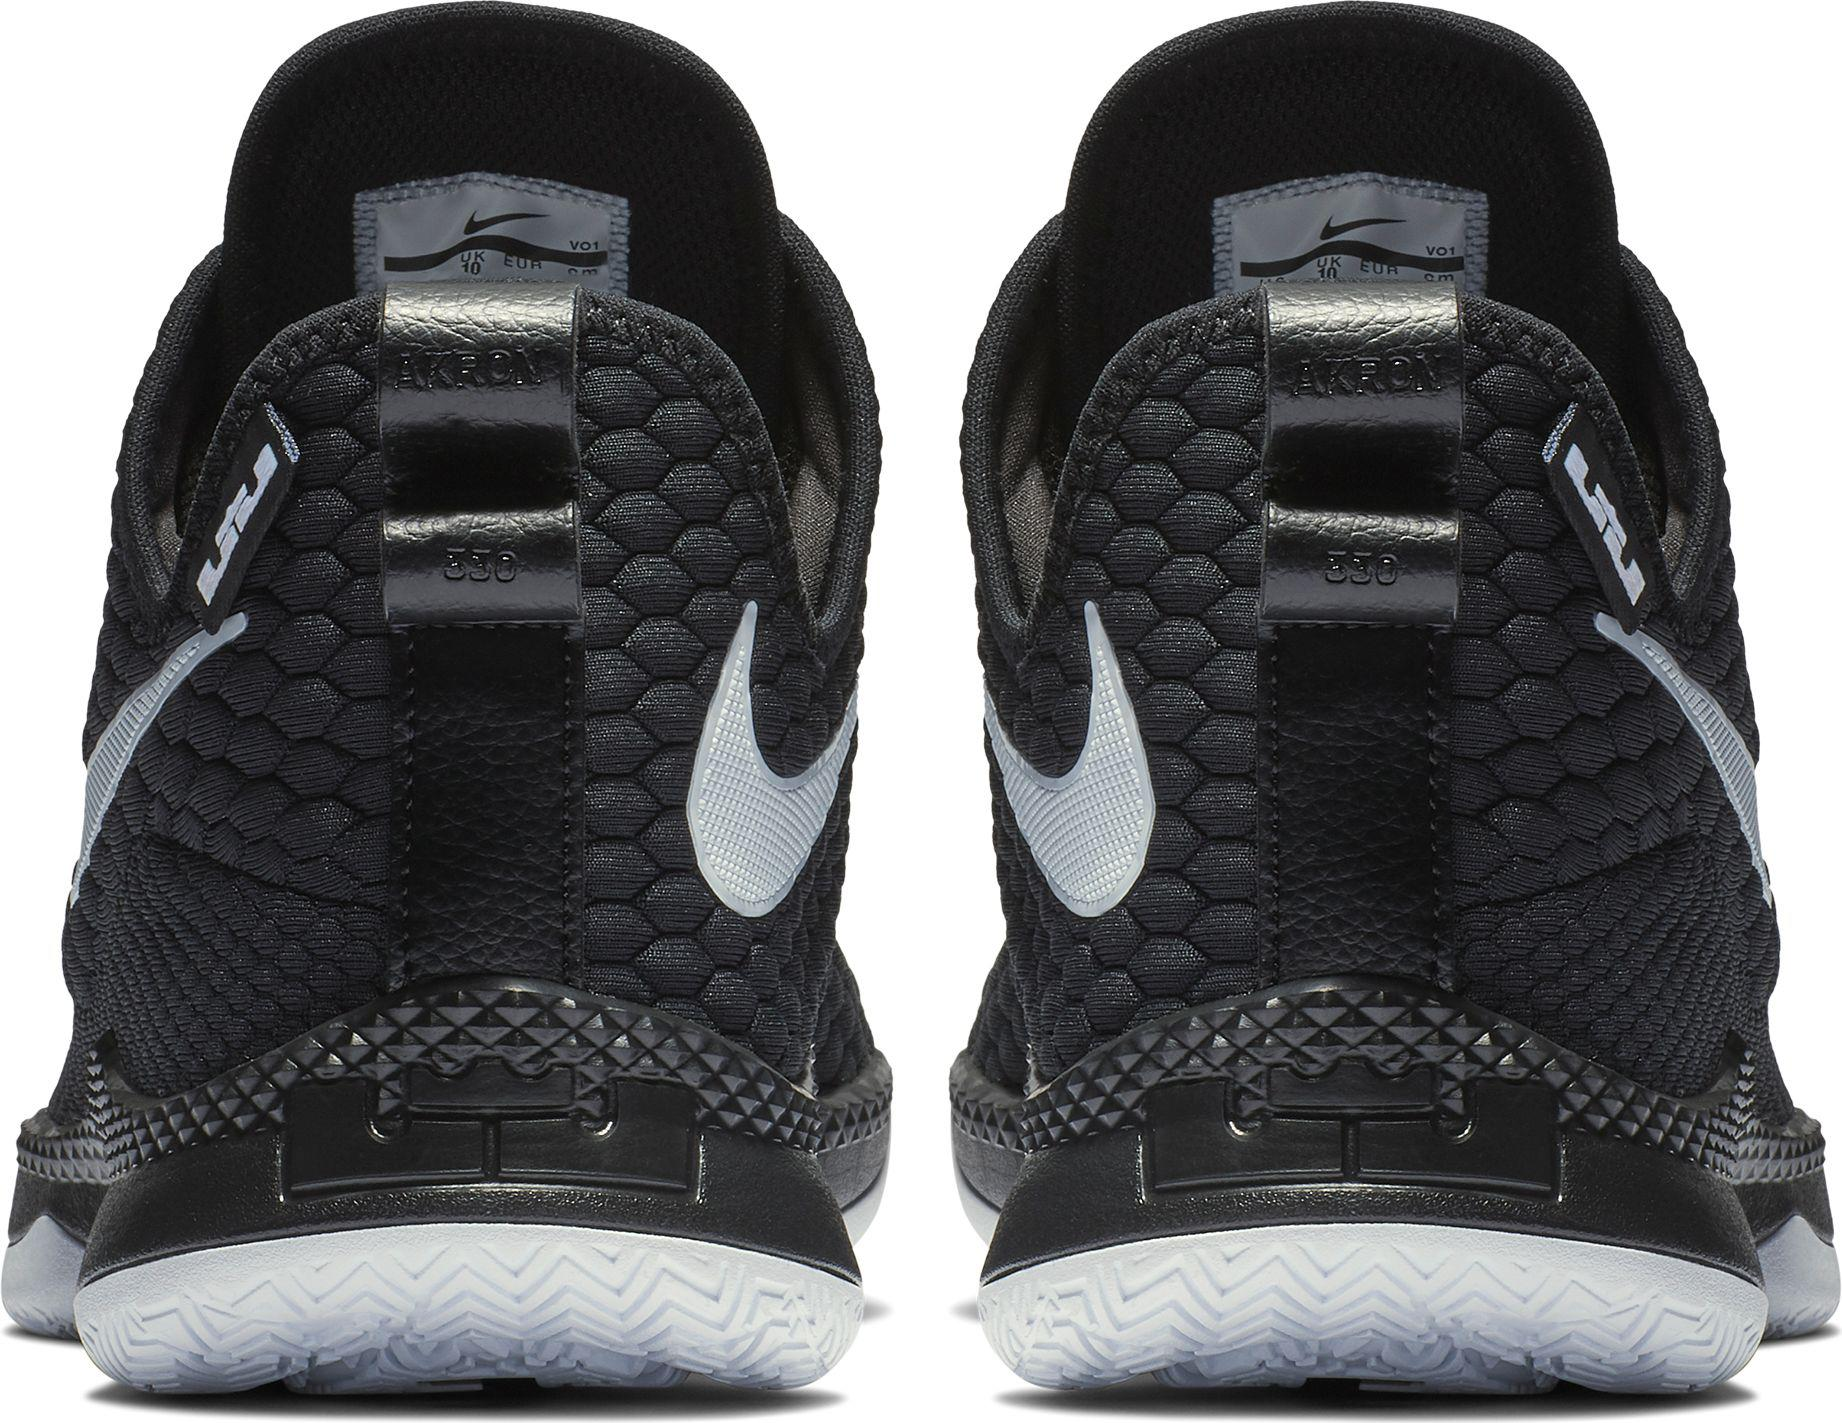 brand new 4c41f 47d05 ... where to buy nike black lebron witness iii basketball shoes for men  lyst. view fullscreen